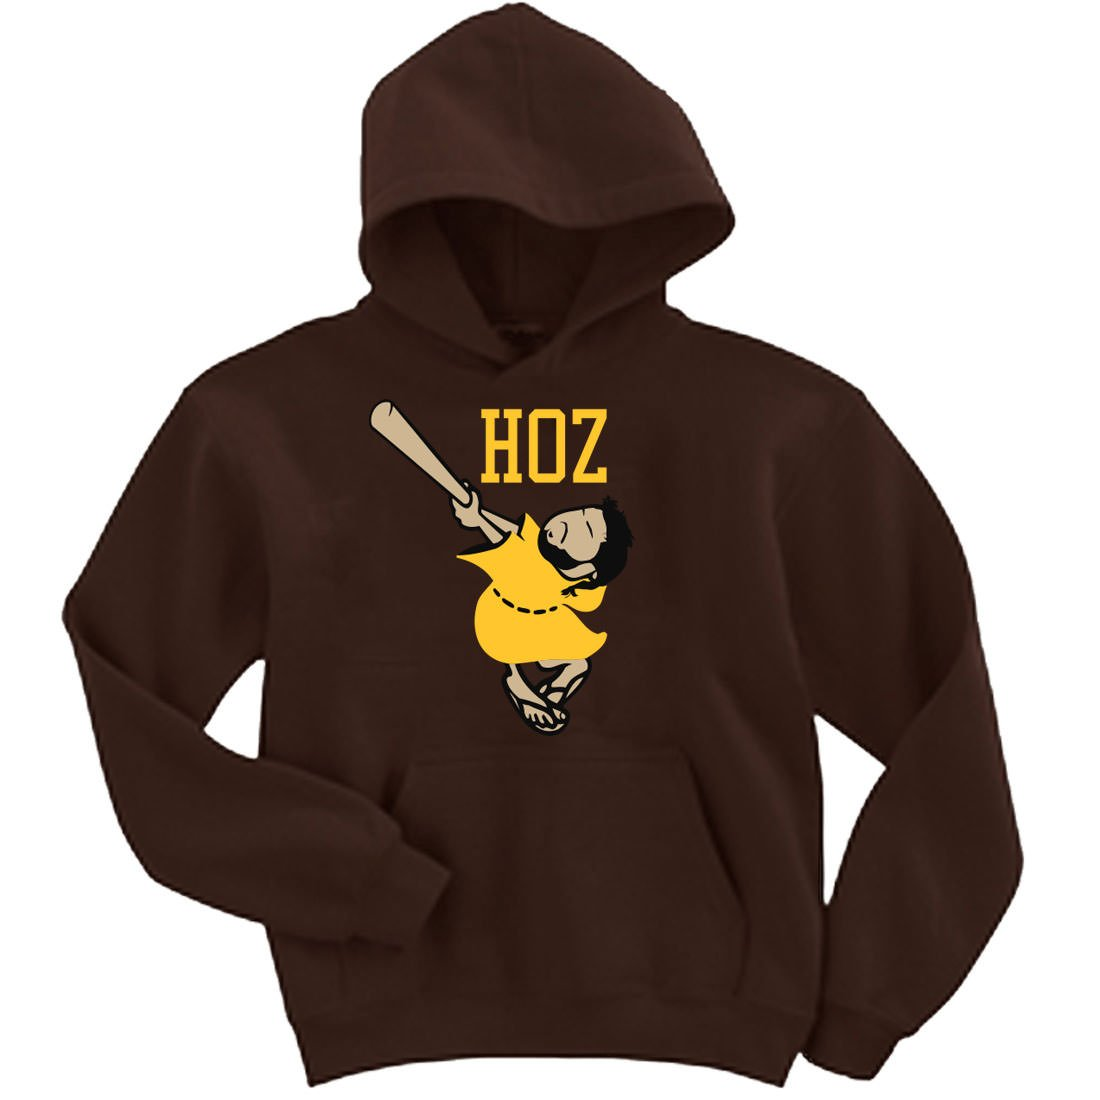 first rate f06dc 92fc6 Amazon.com: Brown Hosmer San Diego Hoz Logo Hooded ...